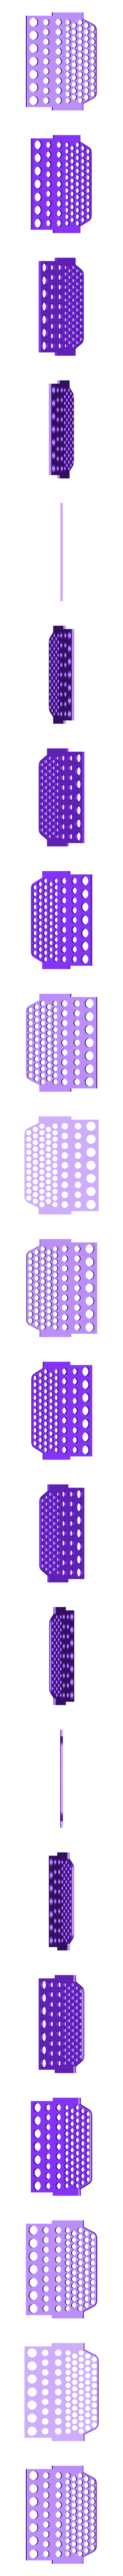 P1.stl Download STL file Brush module c is accessory N ° 1 • Template to 3D print, prusai33